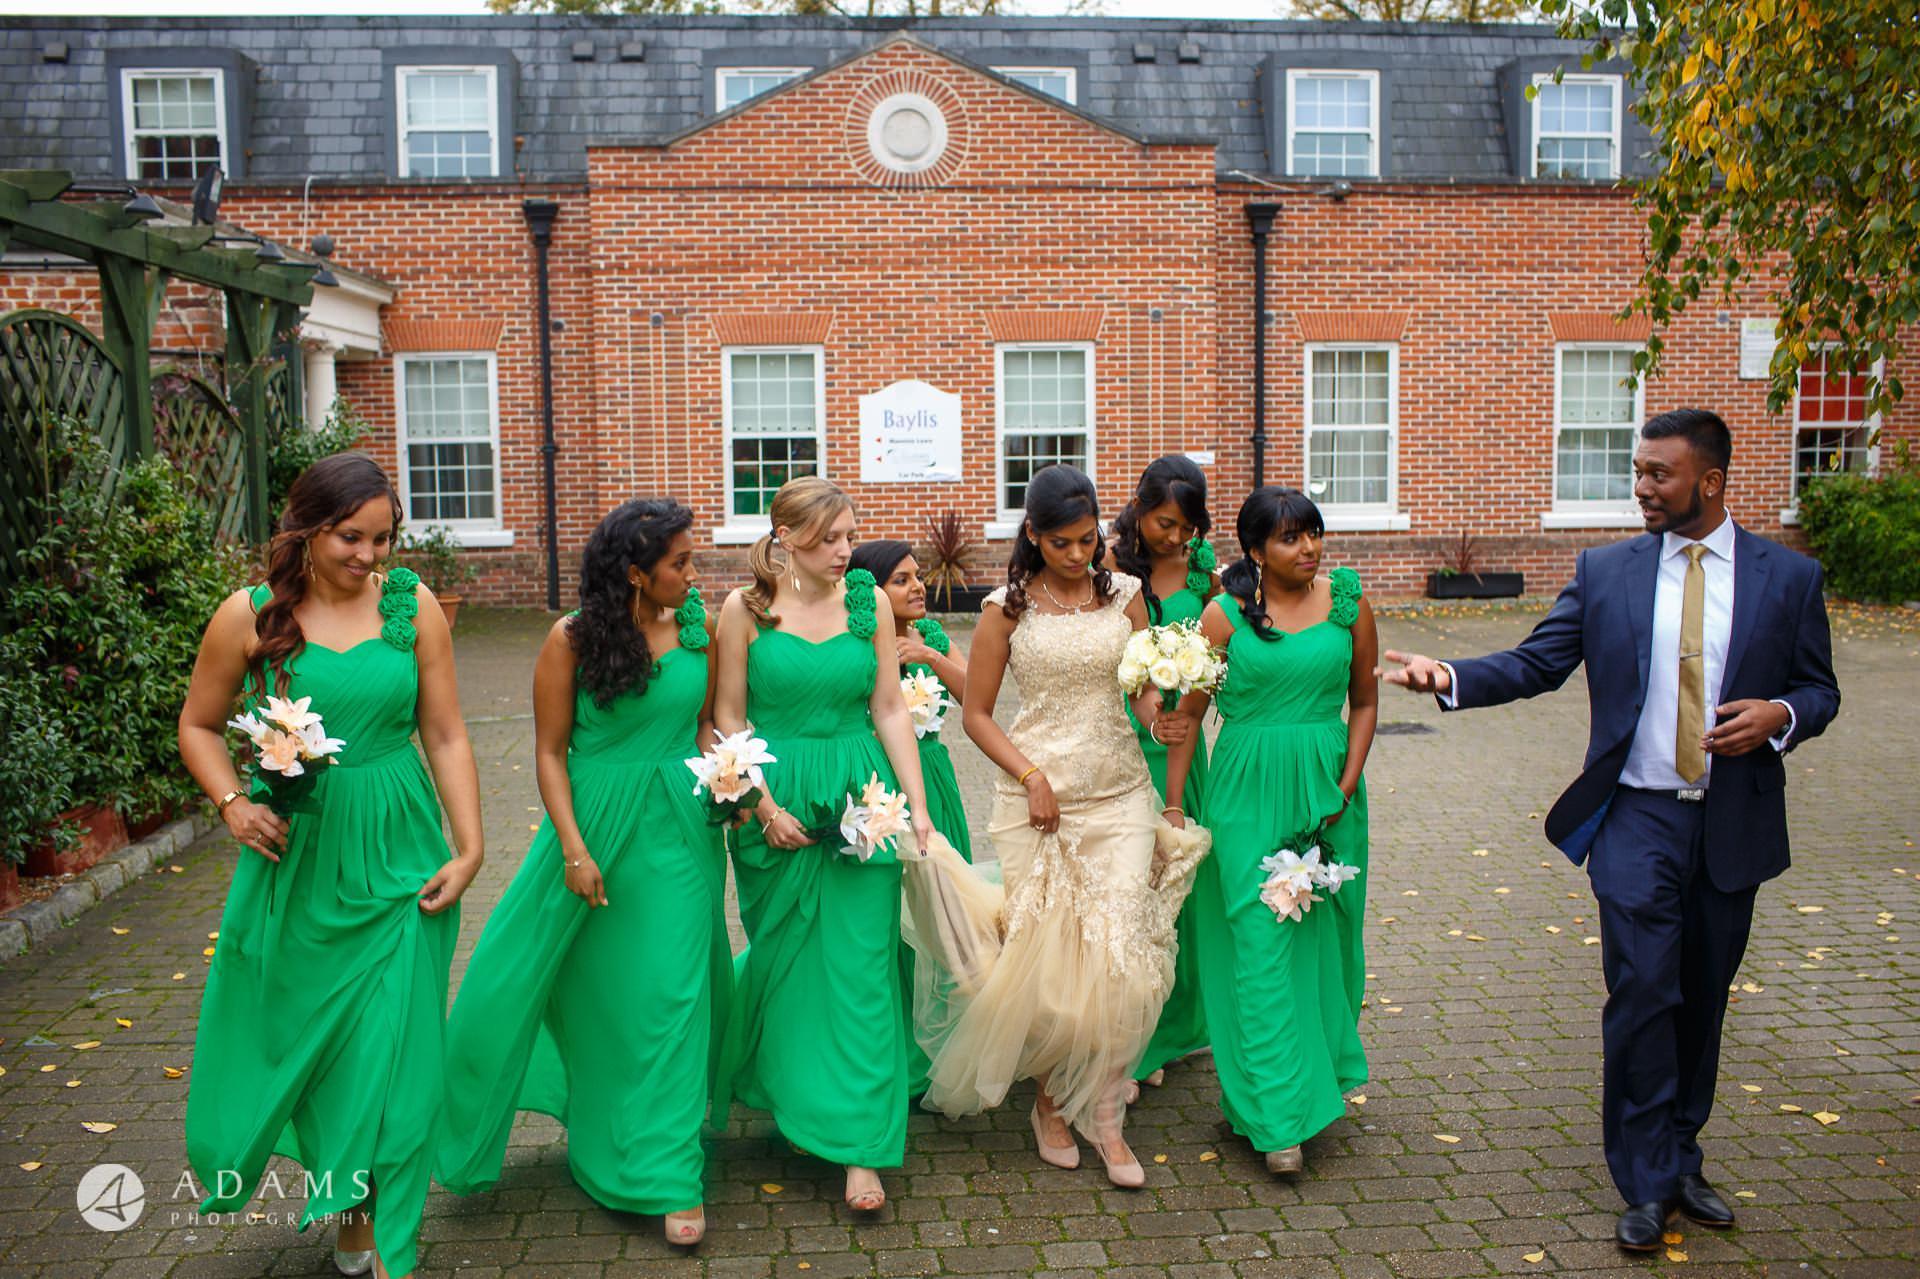 Baylis House Wedding Photographer | Sara + Anojan 10